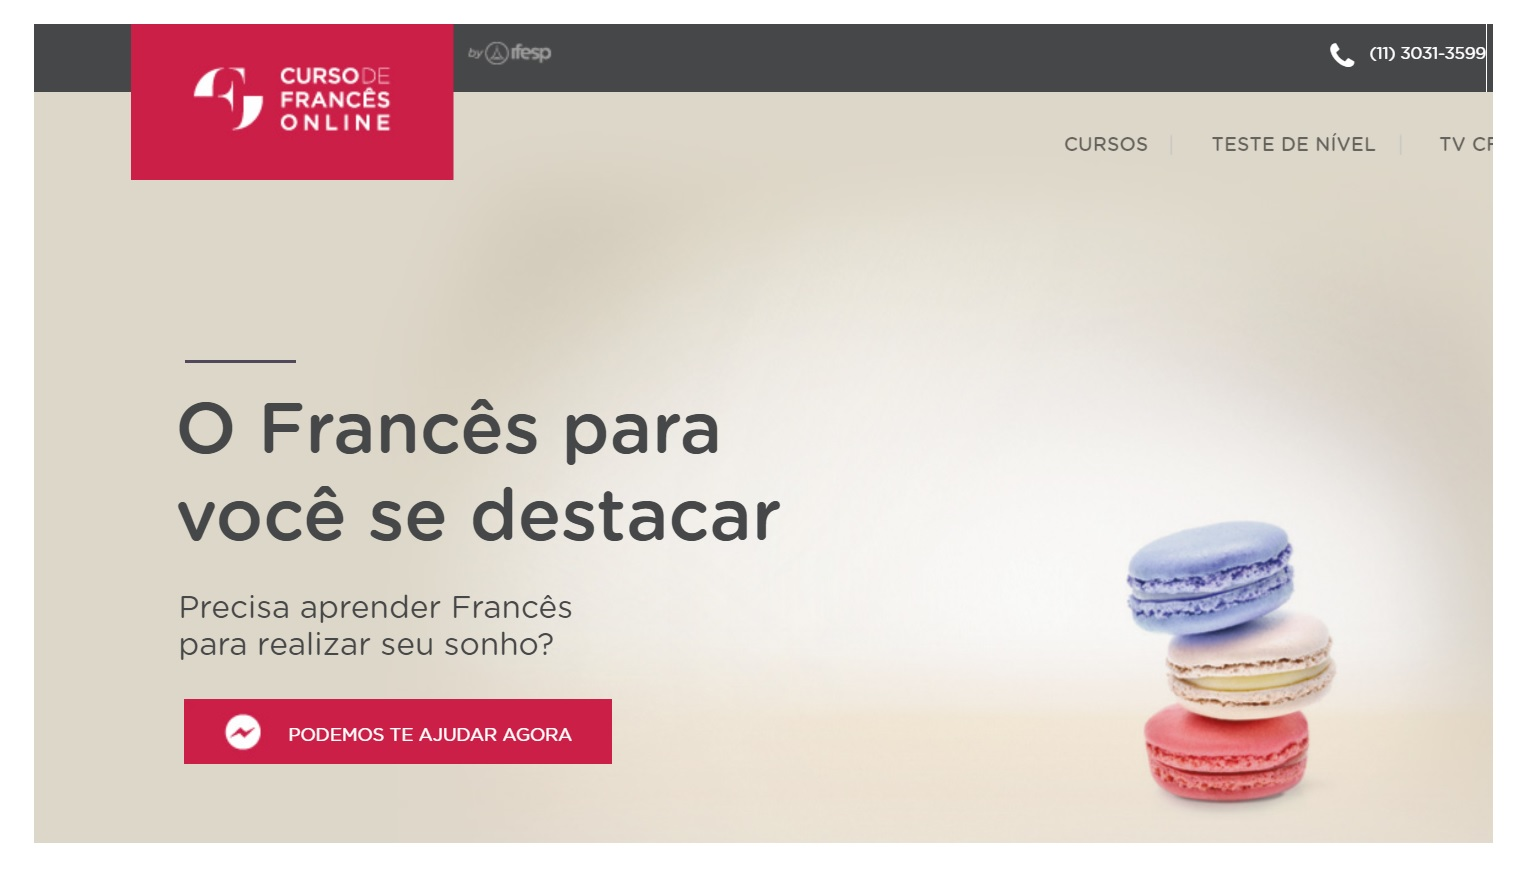 CFOL Curso de Francês online